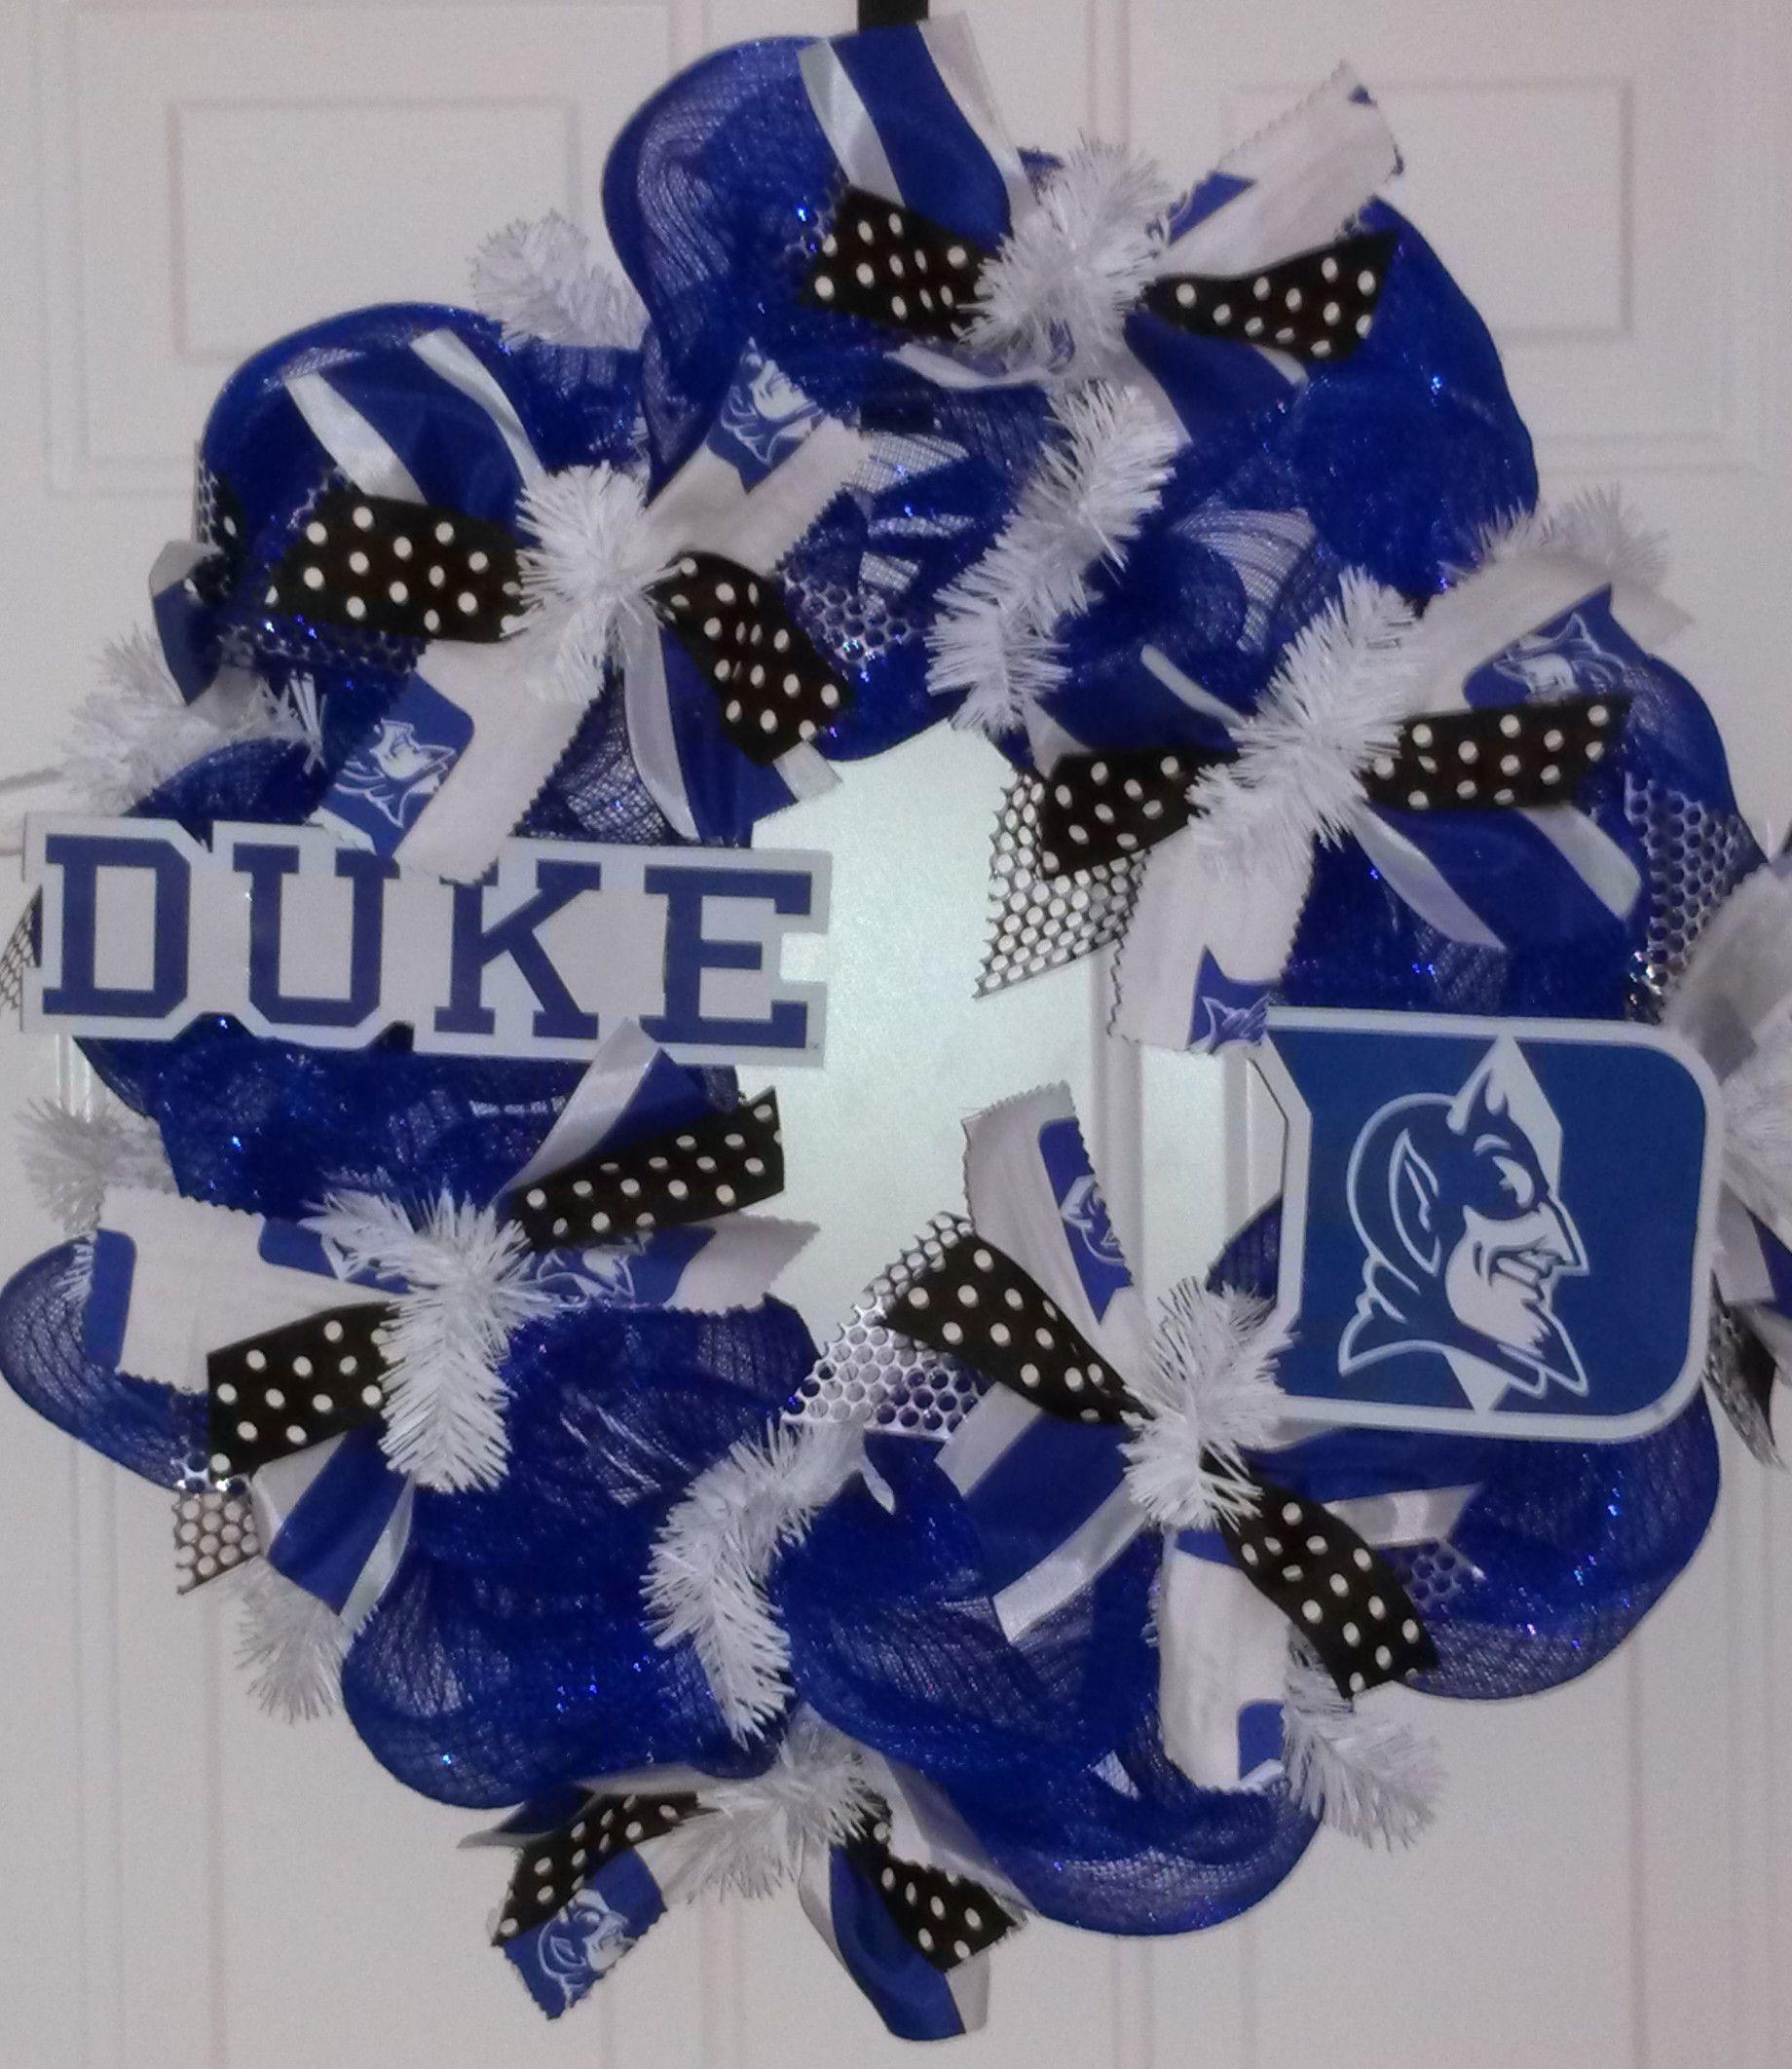 Duke Blue Devils! Reel Sassy Wreaths, handmade by Sonya Snyder, sbslas@hotmail.com for more info!